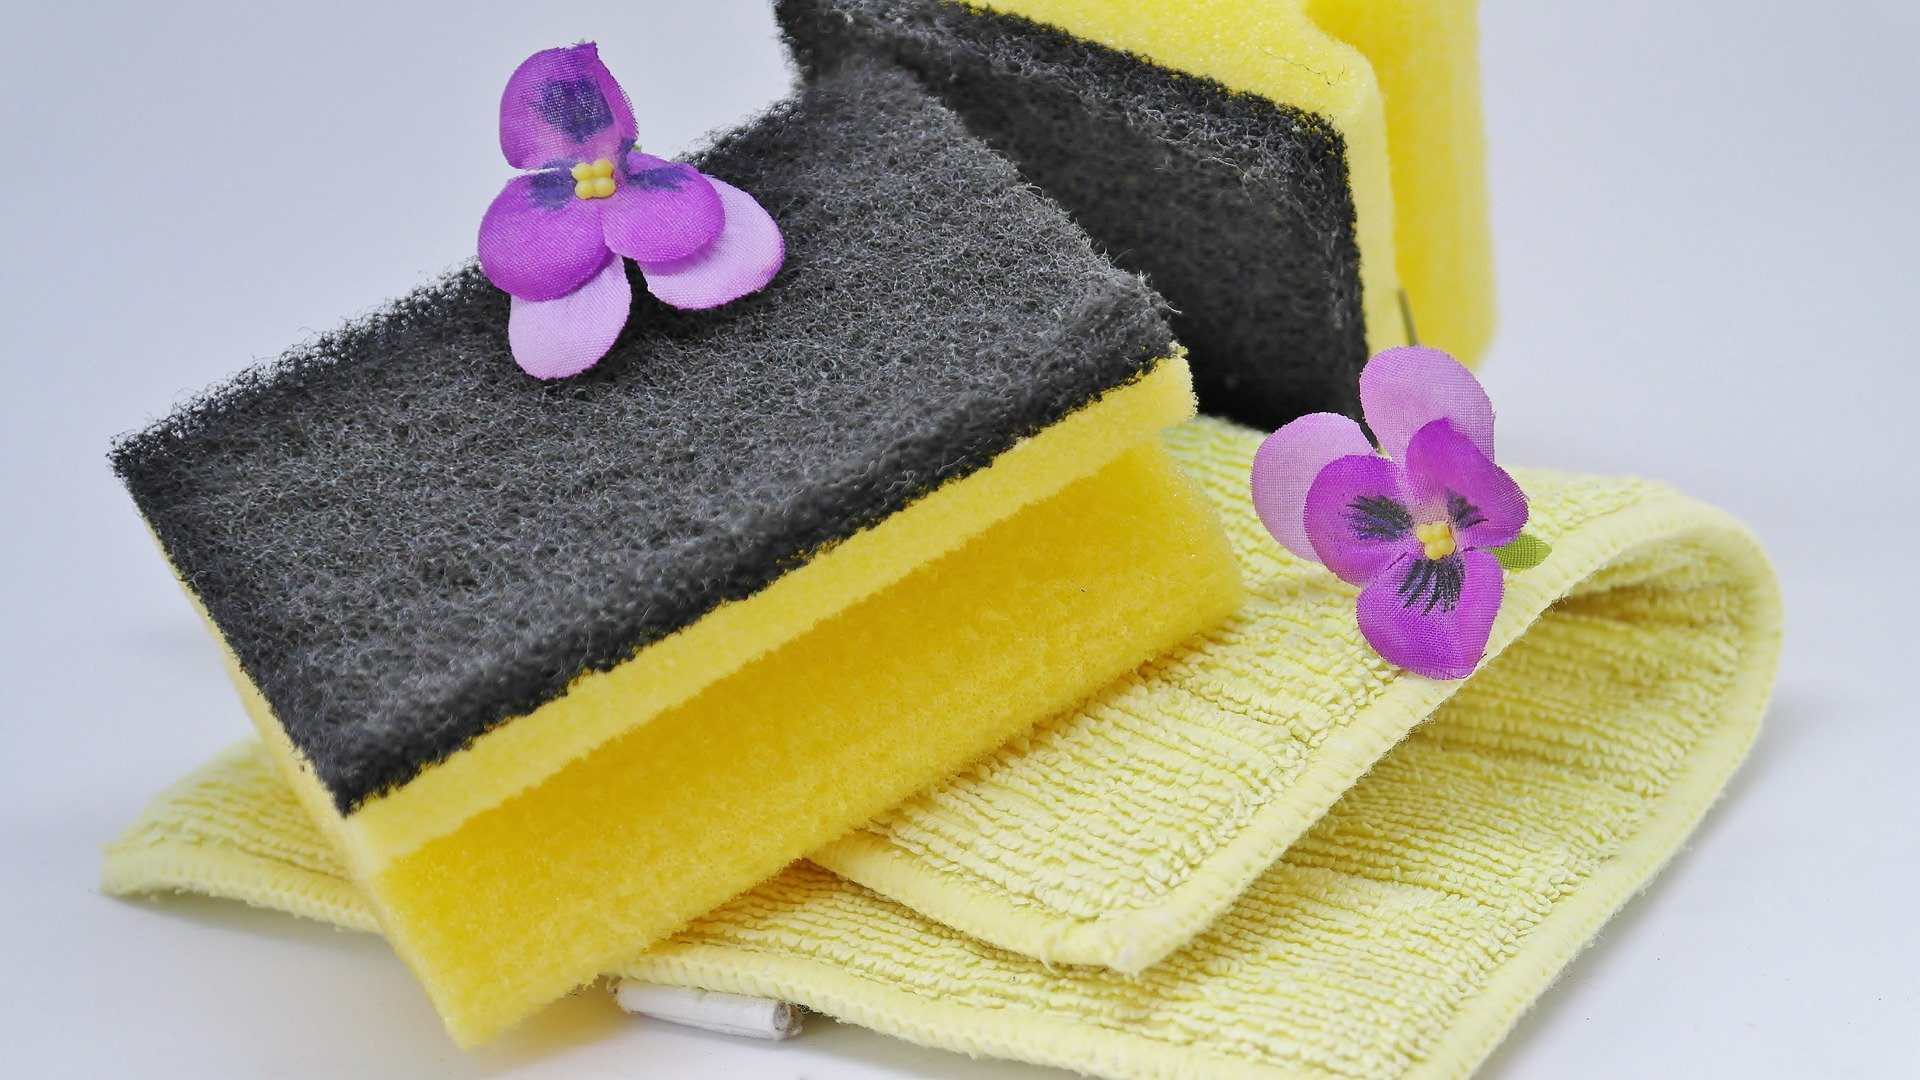 Hygiène maison ménage naturel spray désinfectant